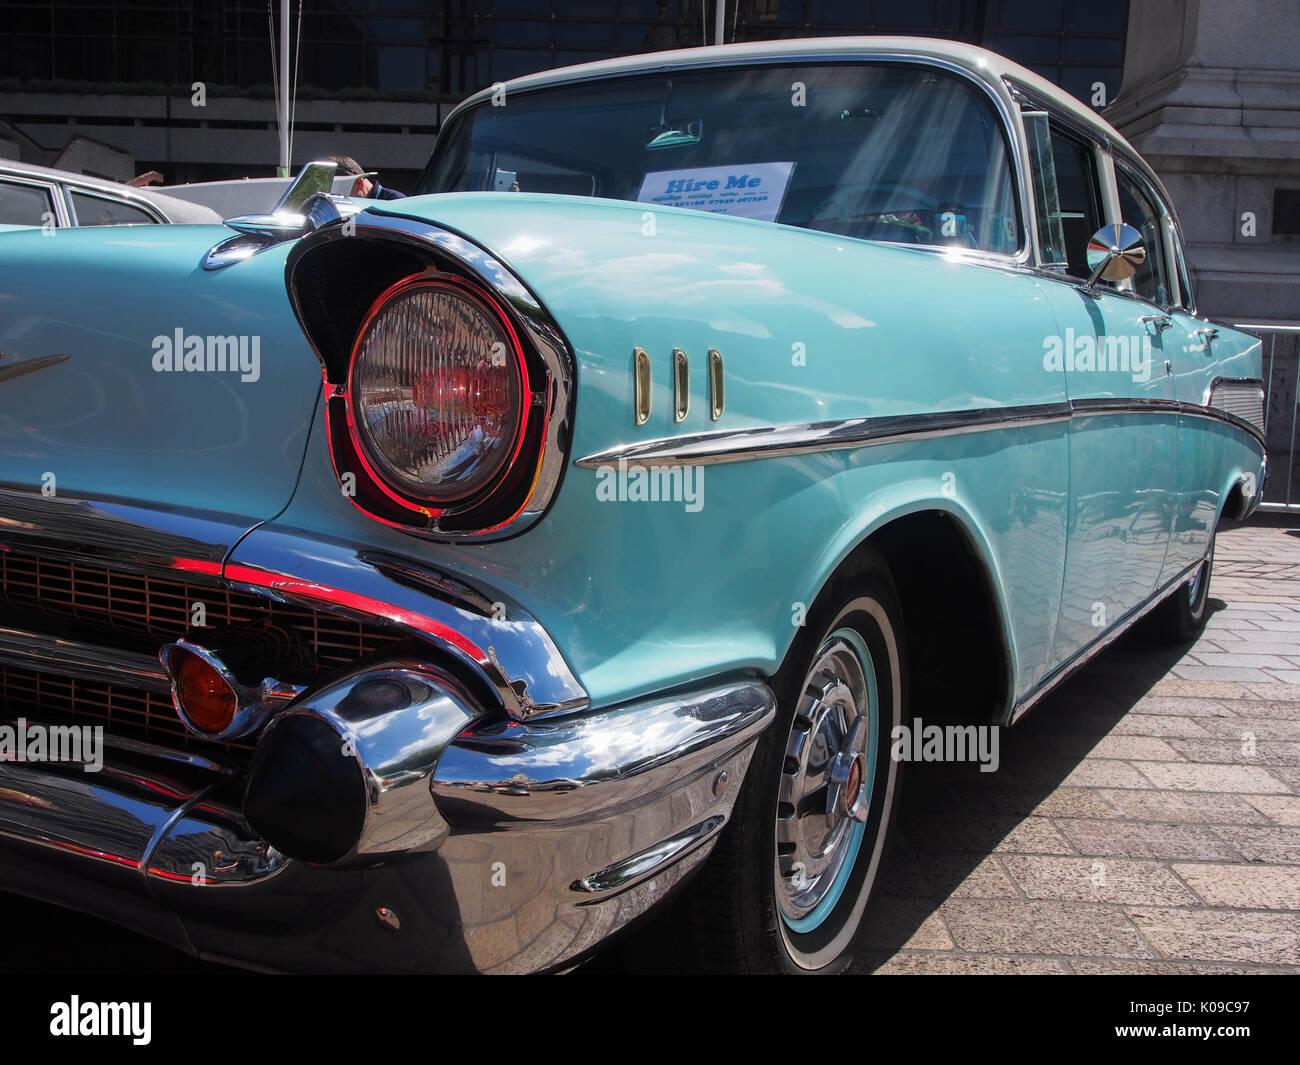 A 1957 Chevrolet Bel Air four door sedan - Stock Image